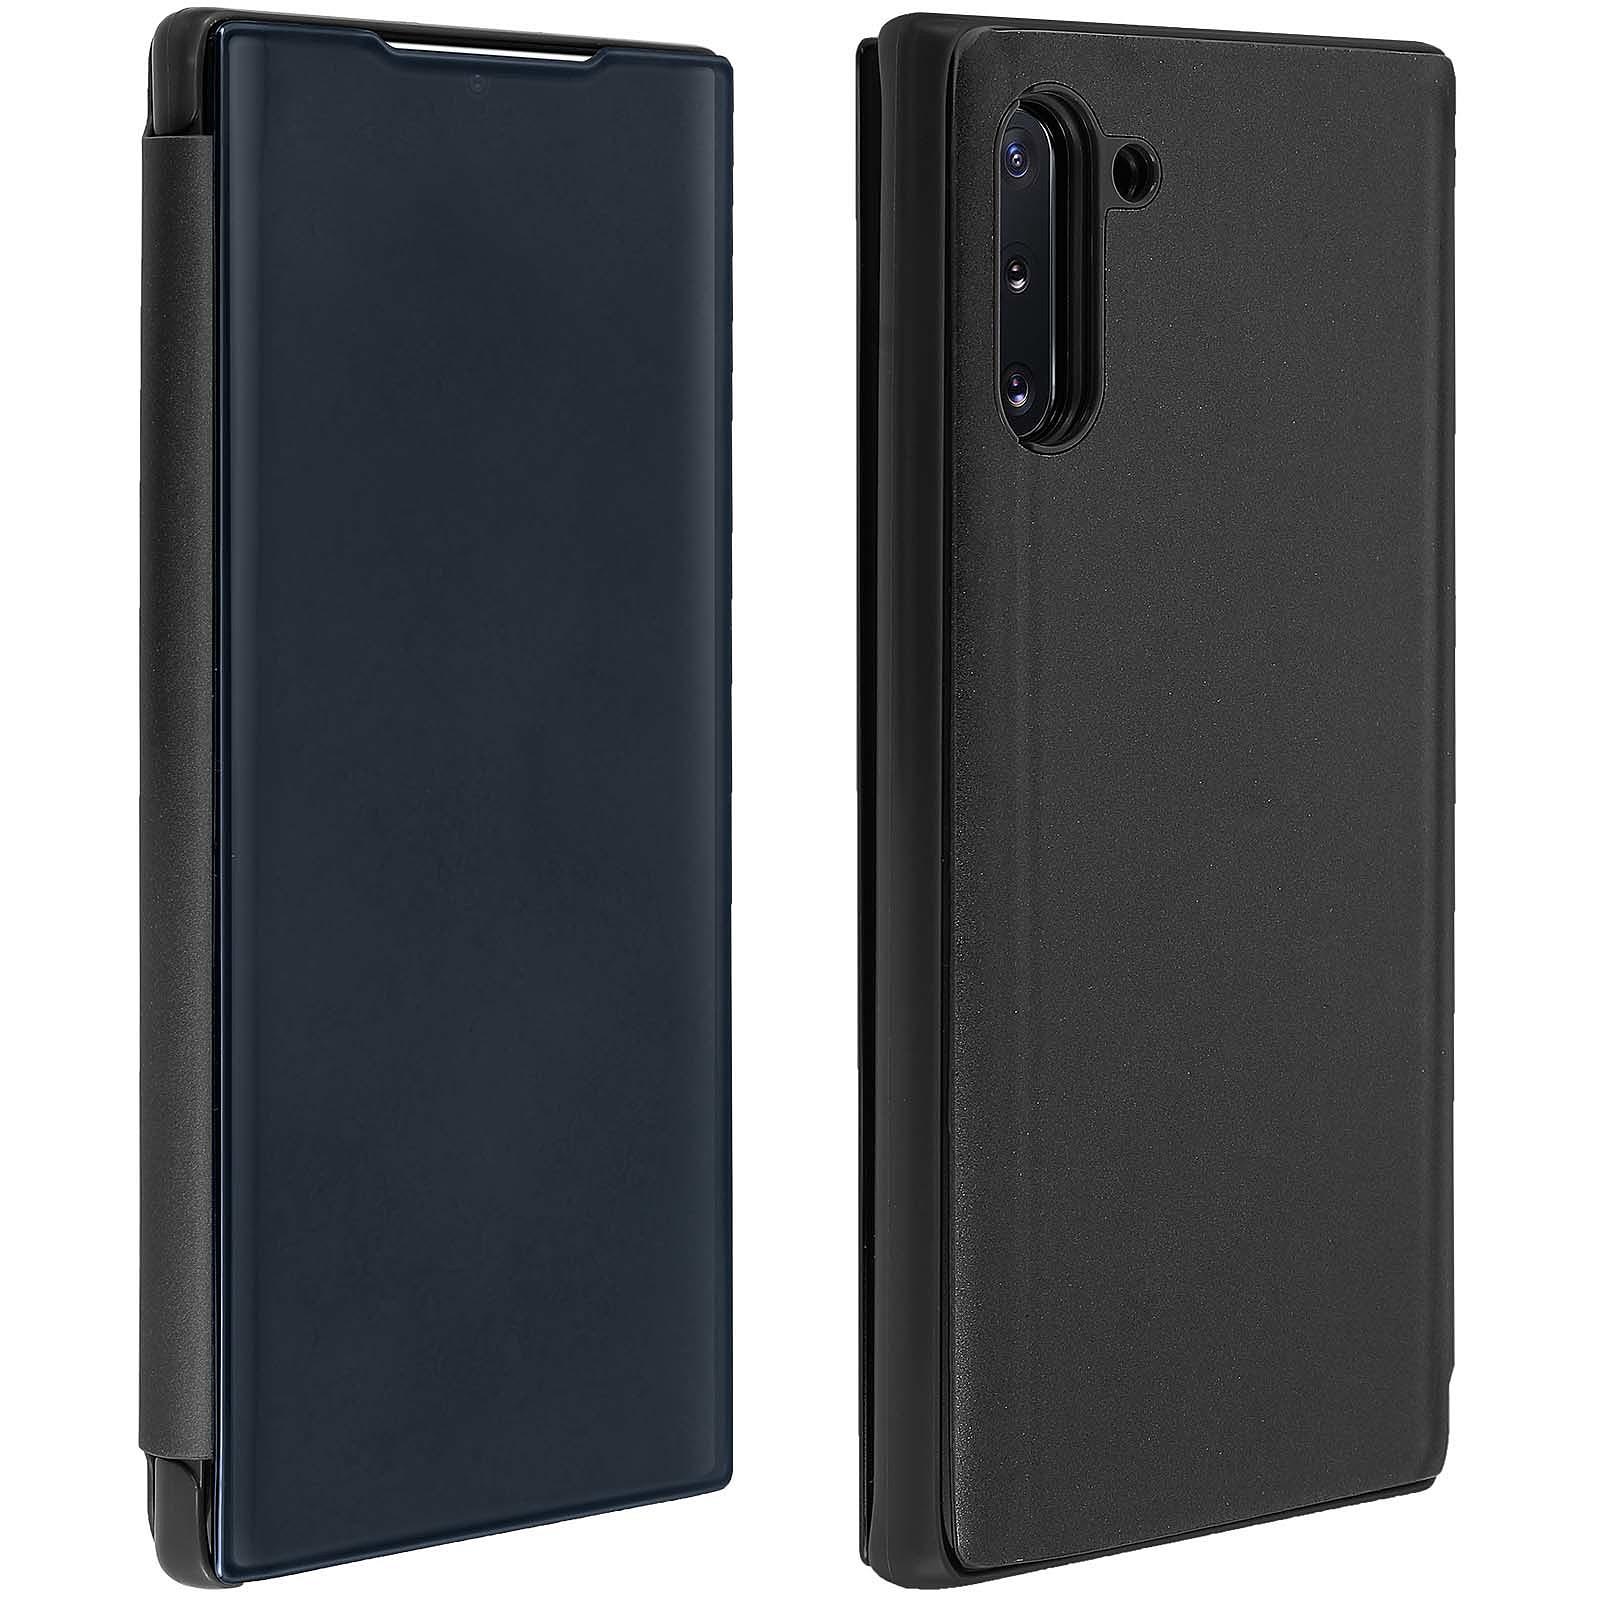 Avizar Etui folio Noir Design Miroir pour Samsung Galaxy Note 10